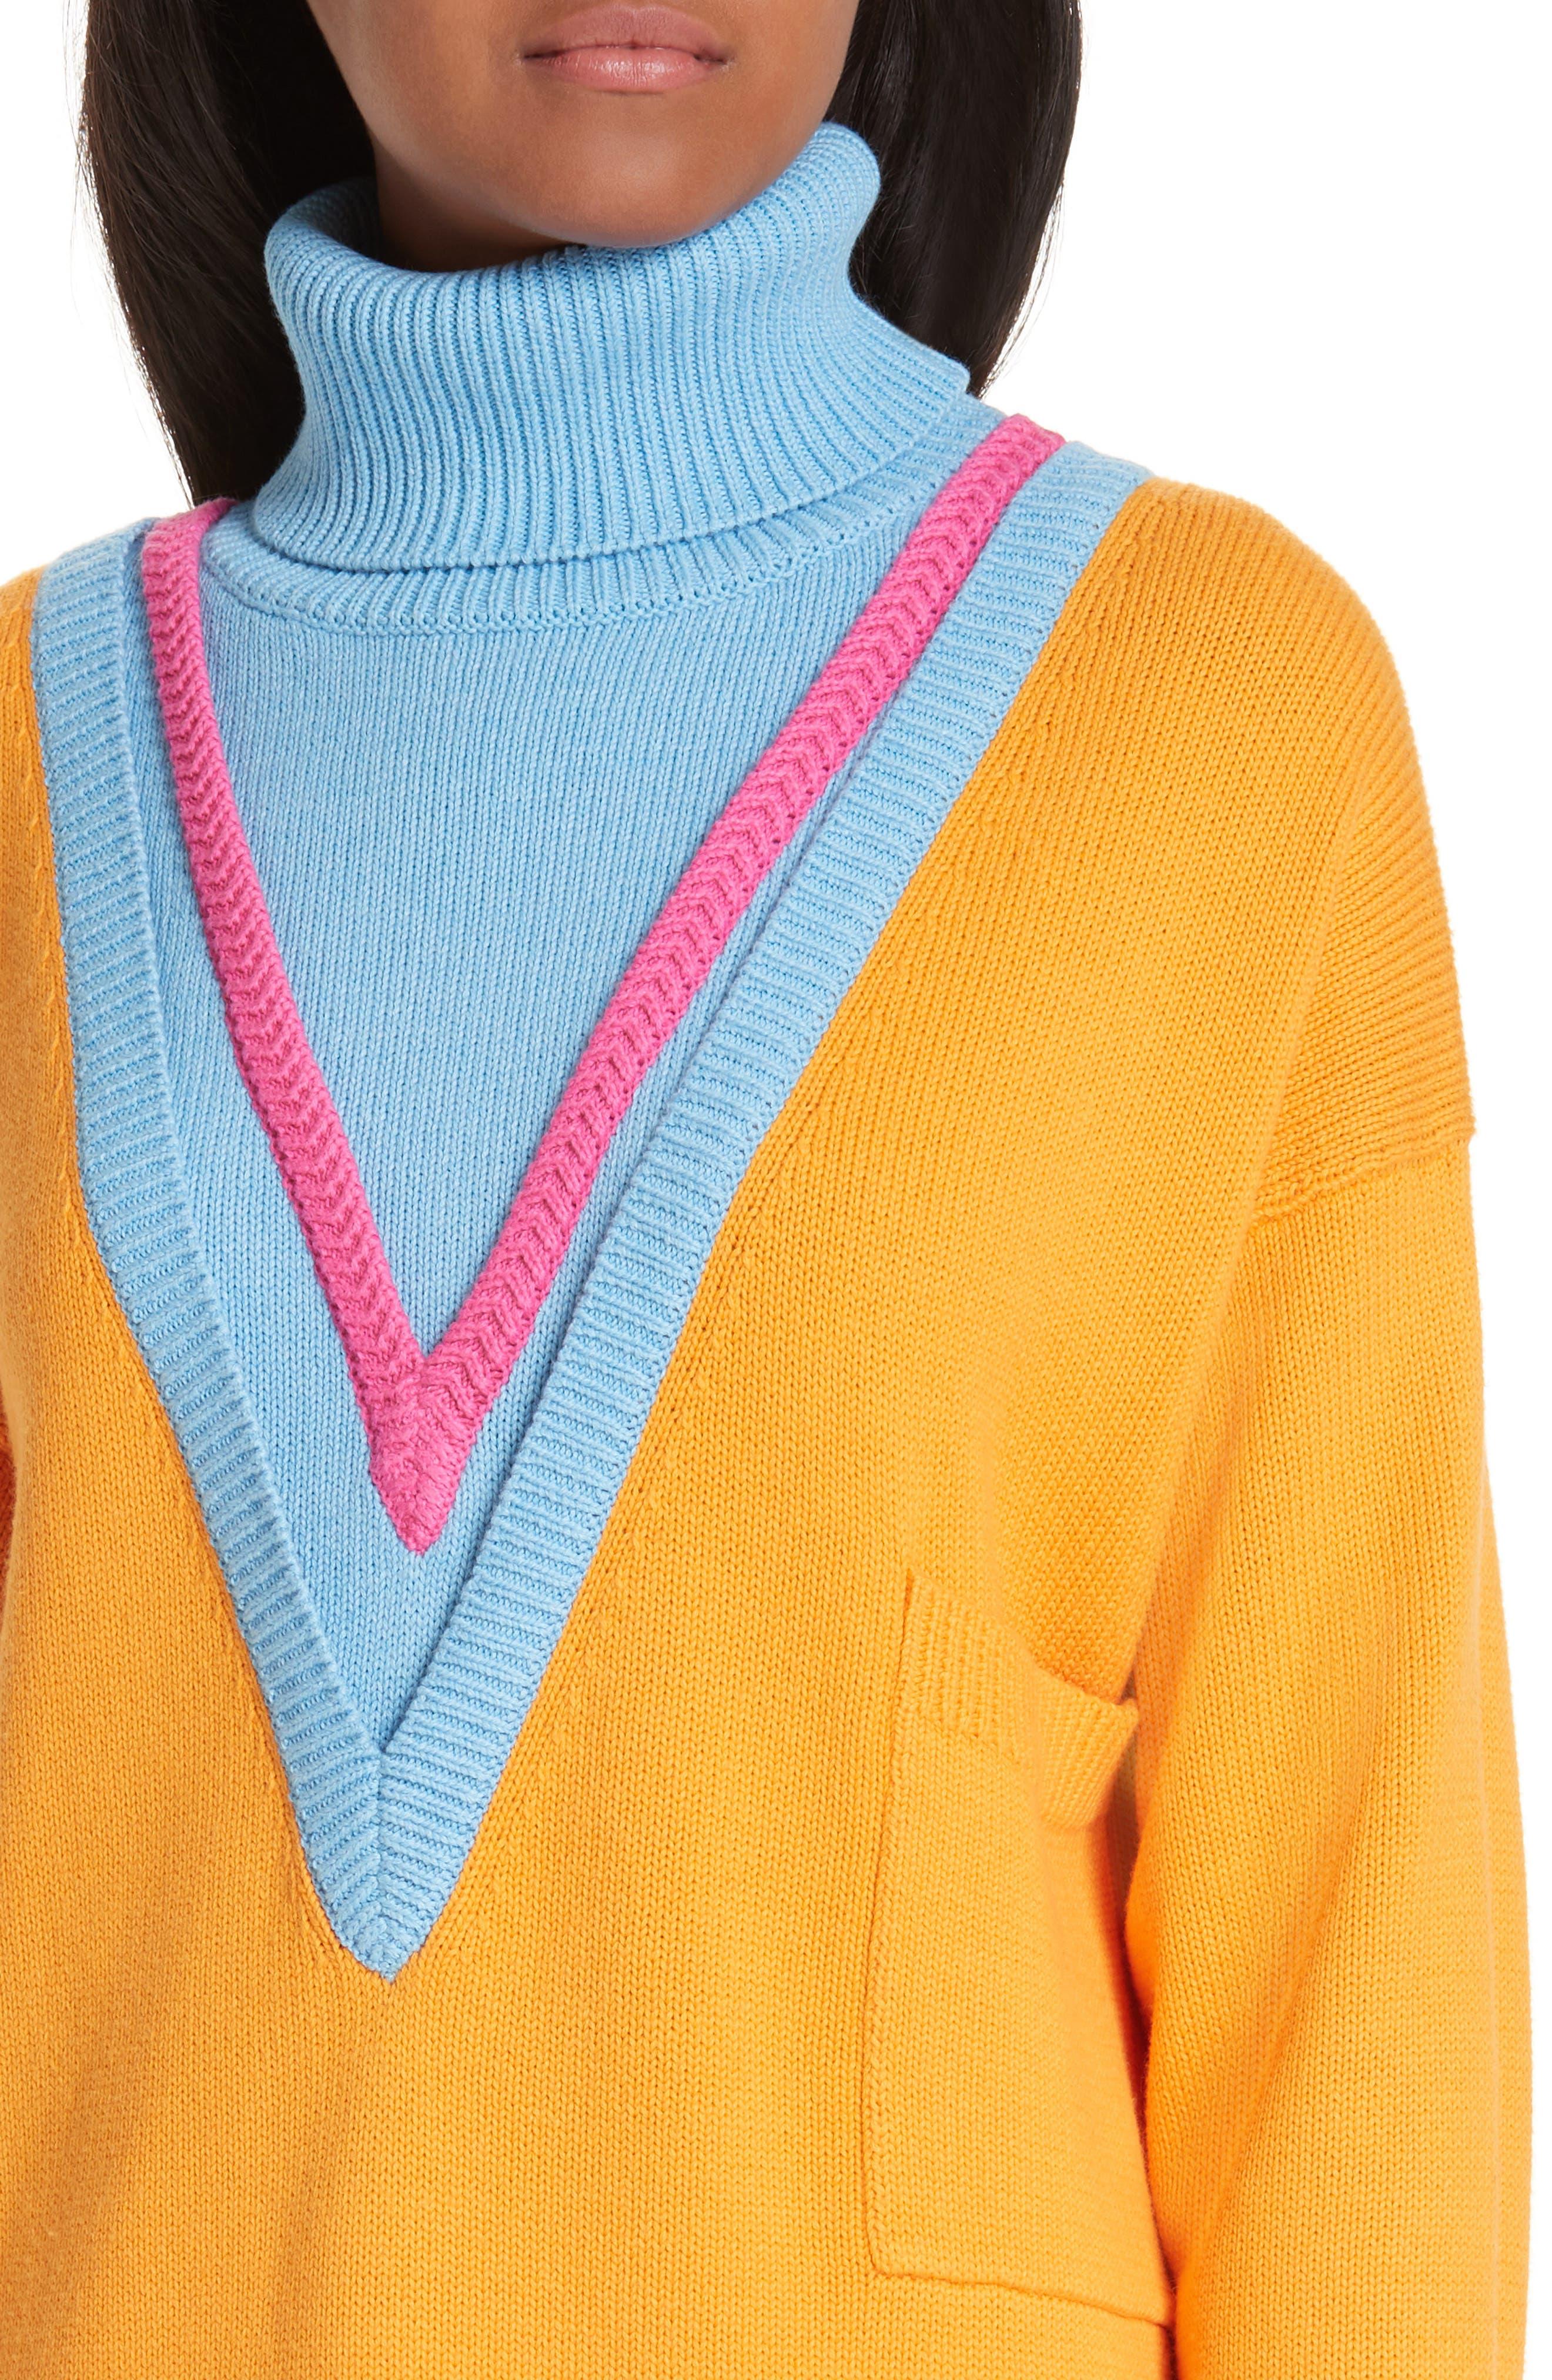 VICTOR GLEMAUD,                             Layered Cotton & Cashmere Turtleneck Sweater,                             Alternate thumbnail 4, color,                             ORANGE COMBO